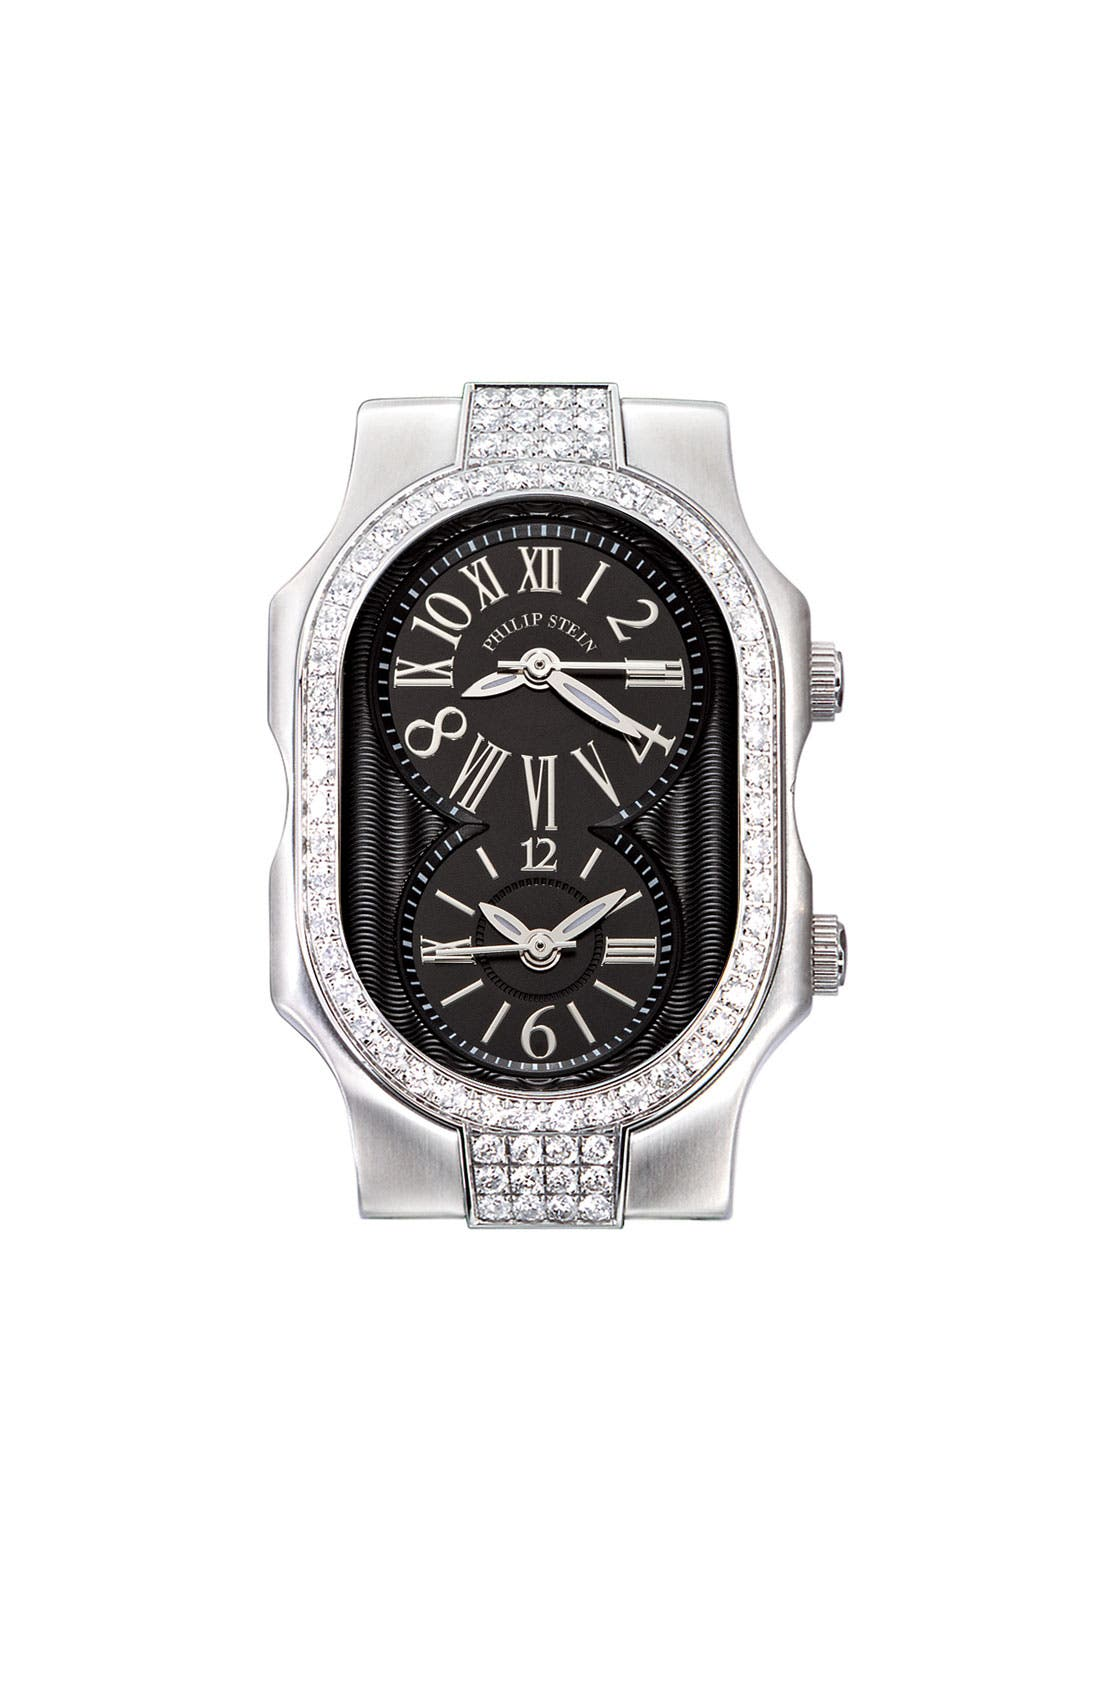 Main Image - Philip Stein® 'Signature' Small Double Diamond Bezel Watch Case